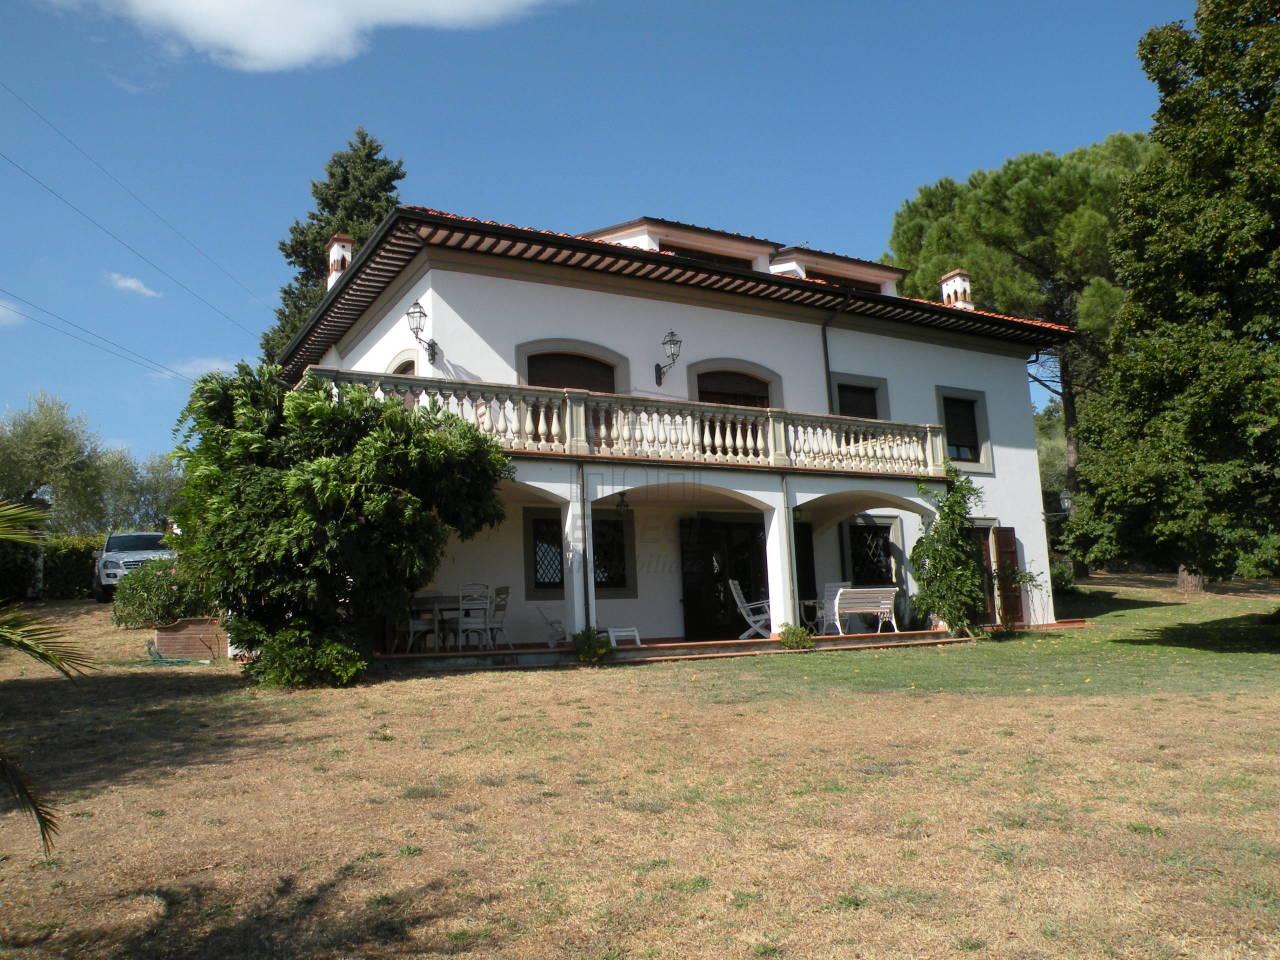 IA00959 Lucca S. Alessio